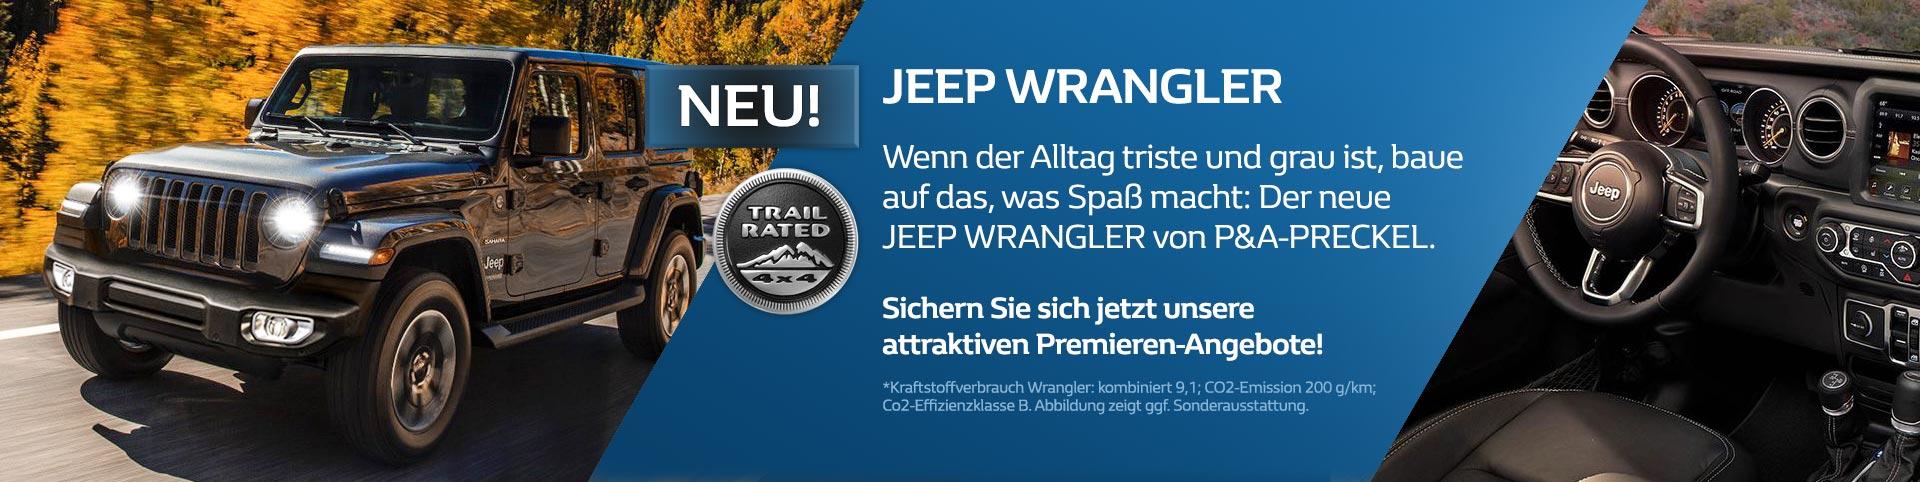 Neuer Jeep Wrangler vom Autozentrum P&A-Preckel